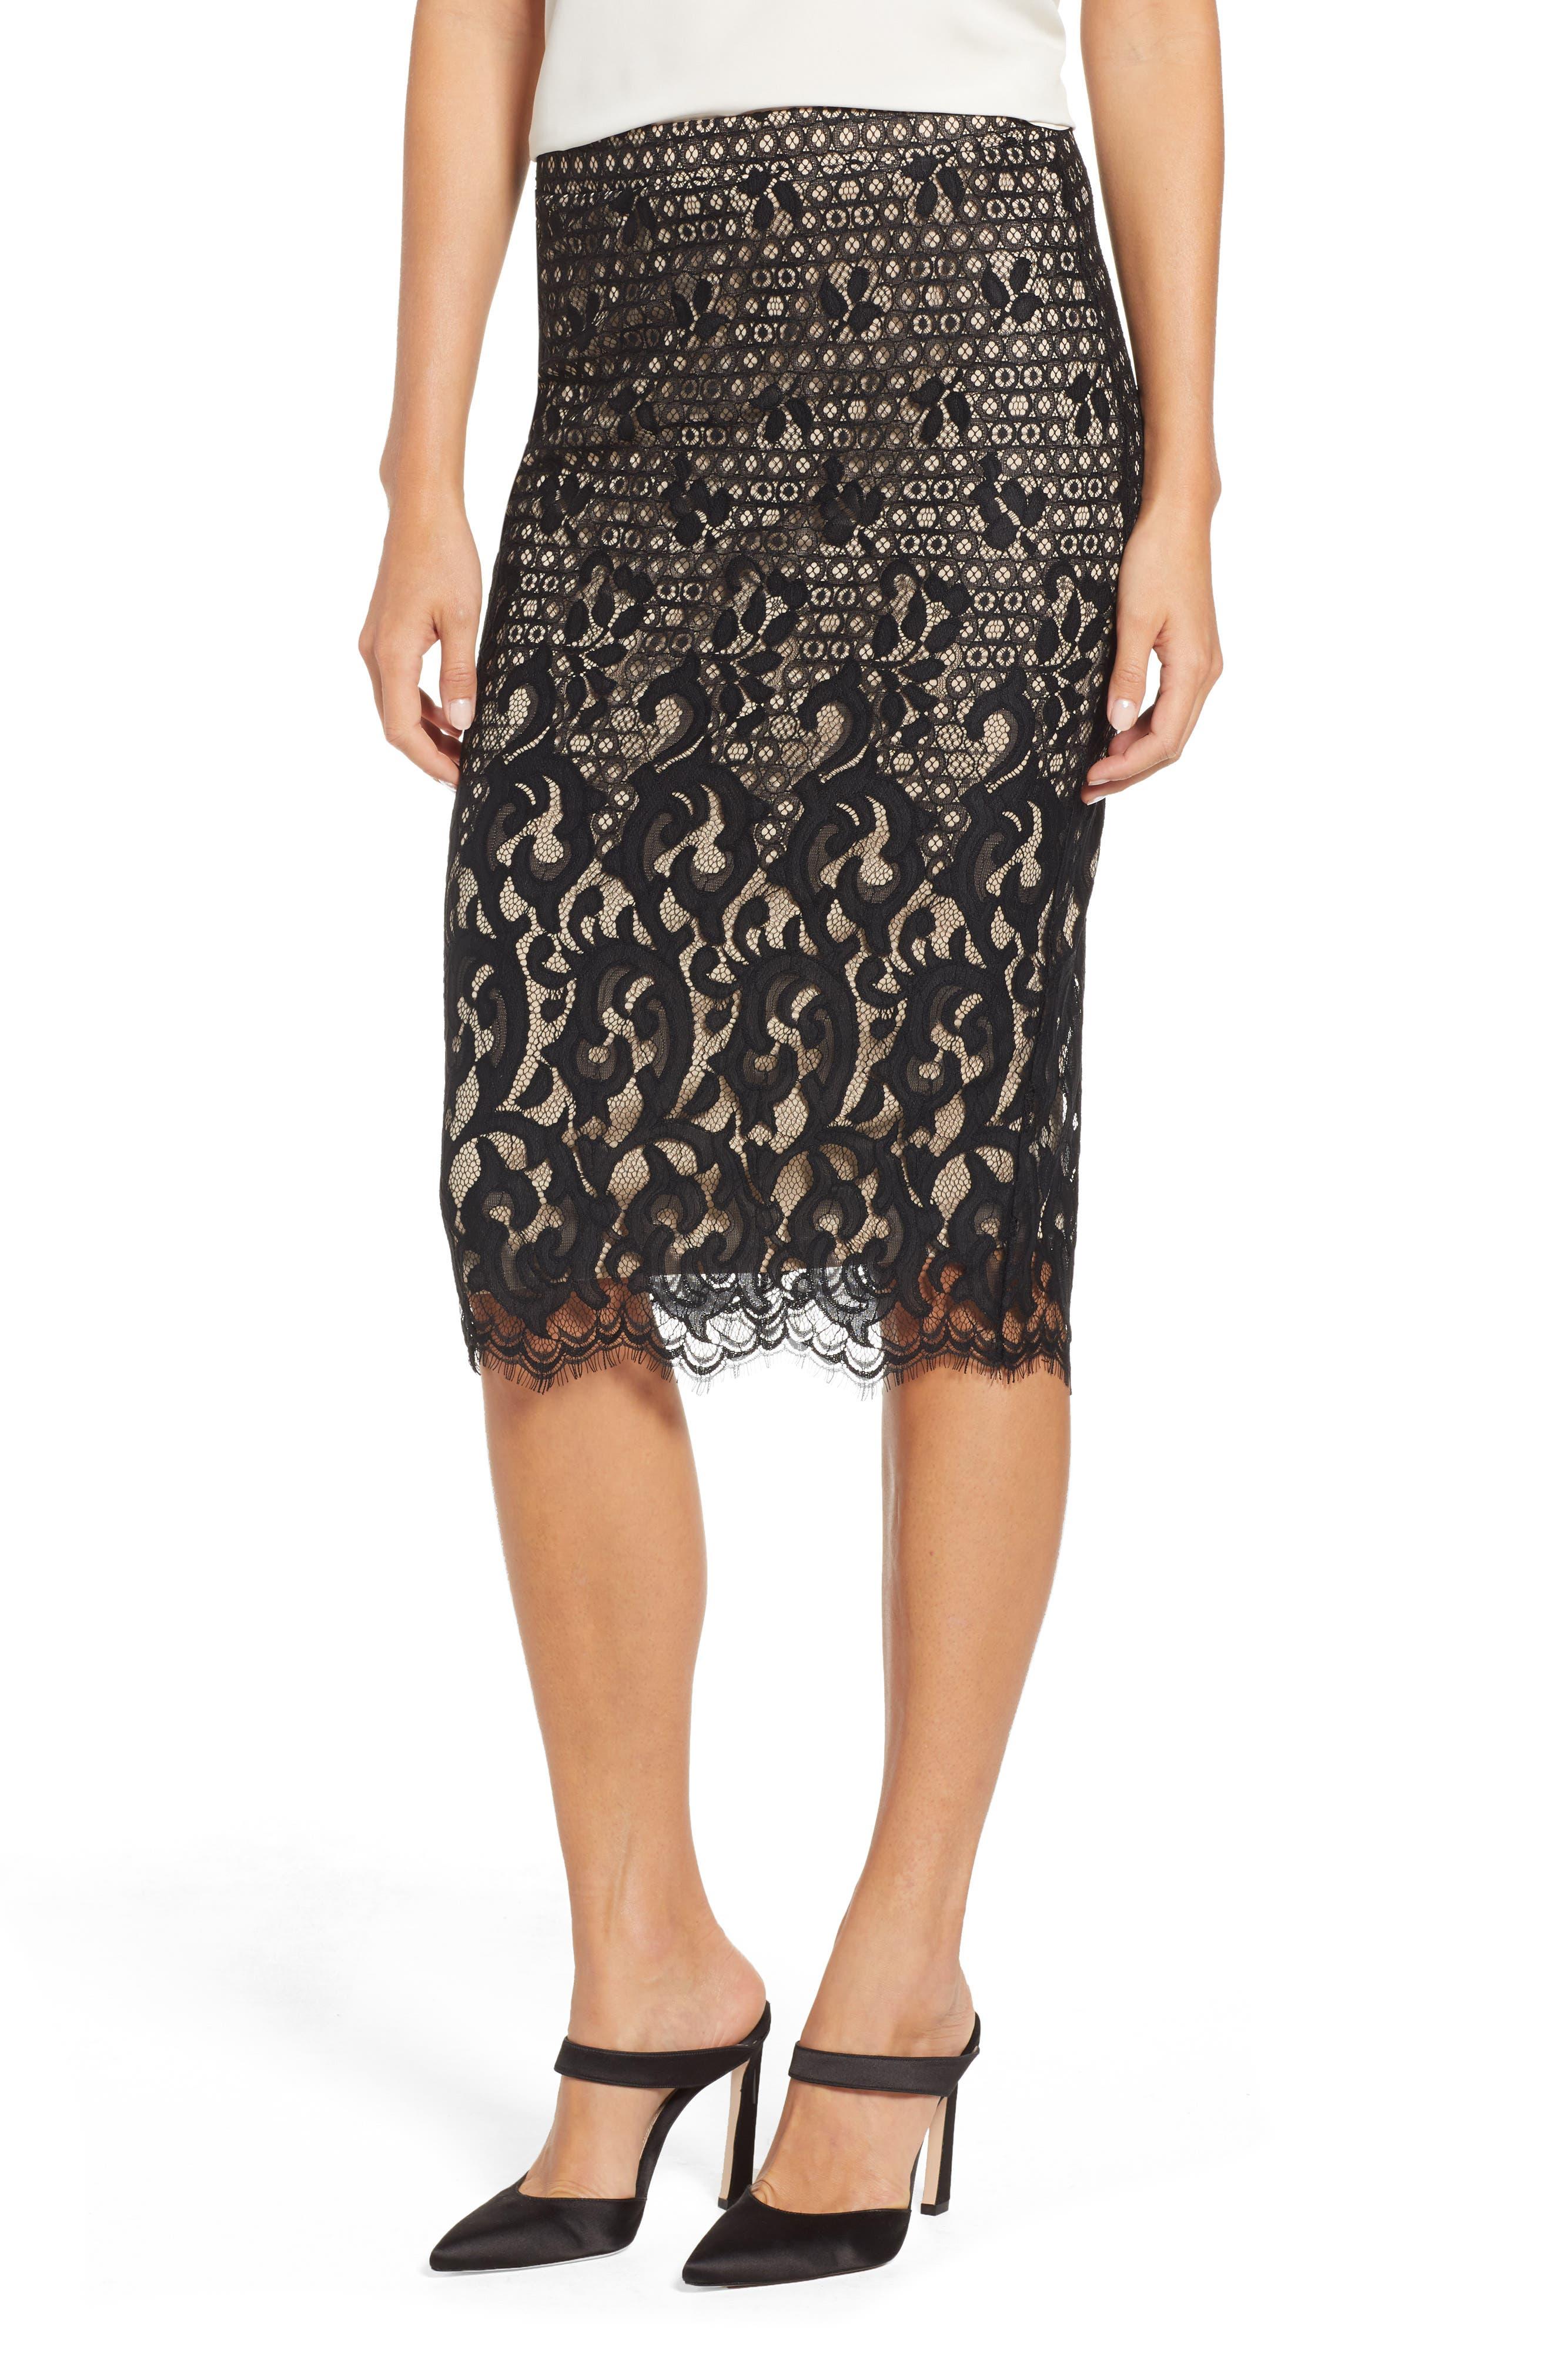 Tdc Lace Pencil Skirt